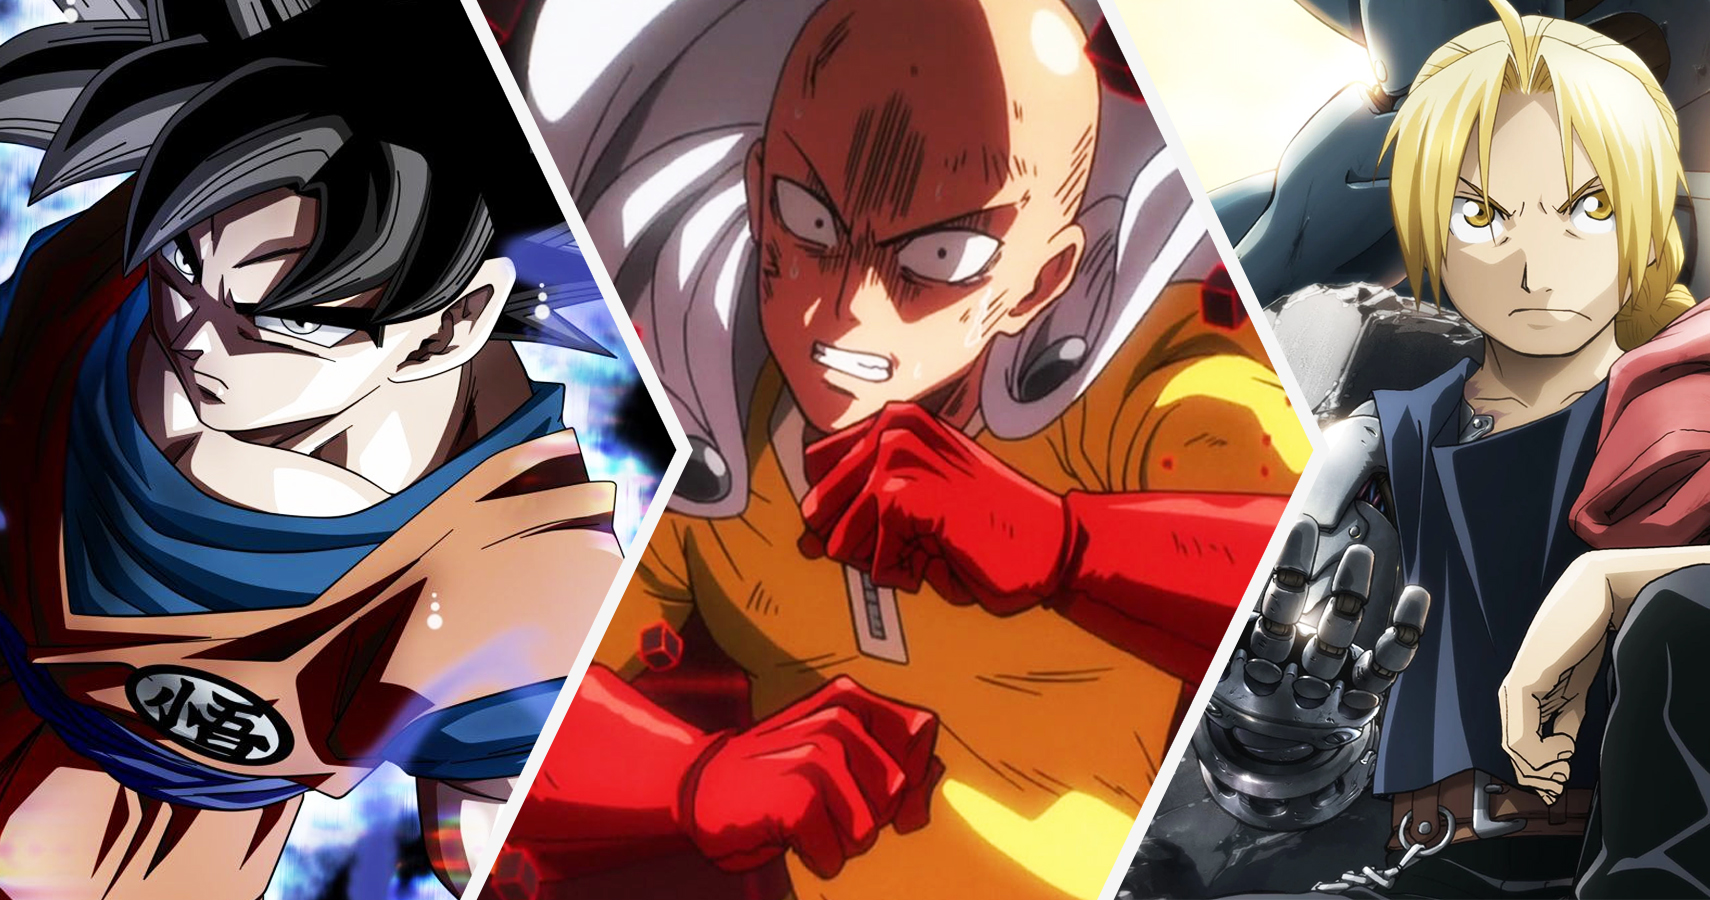 anime characters power manga powerful popular animes